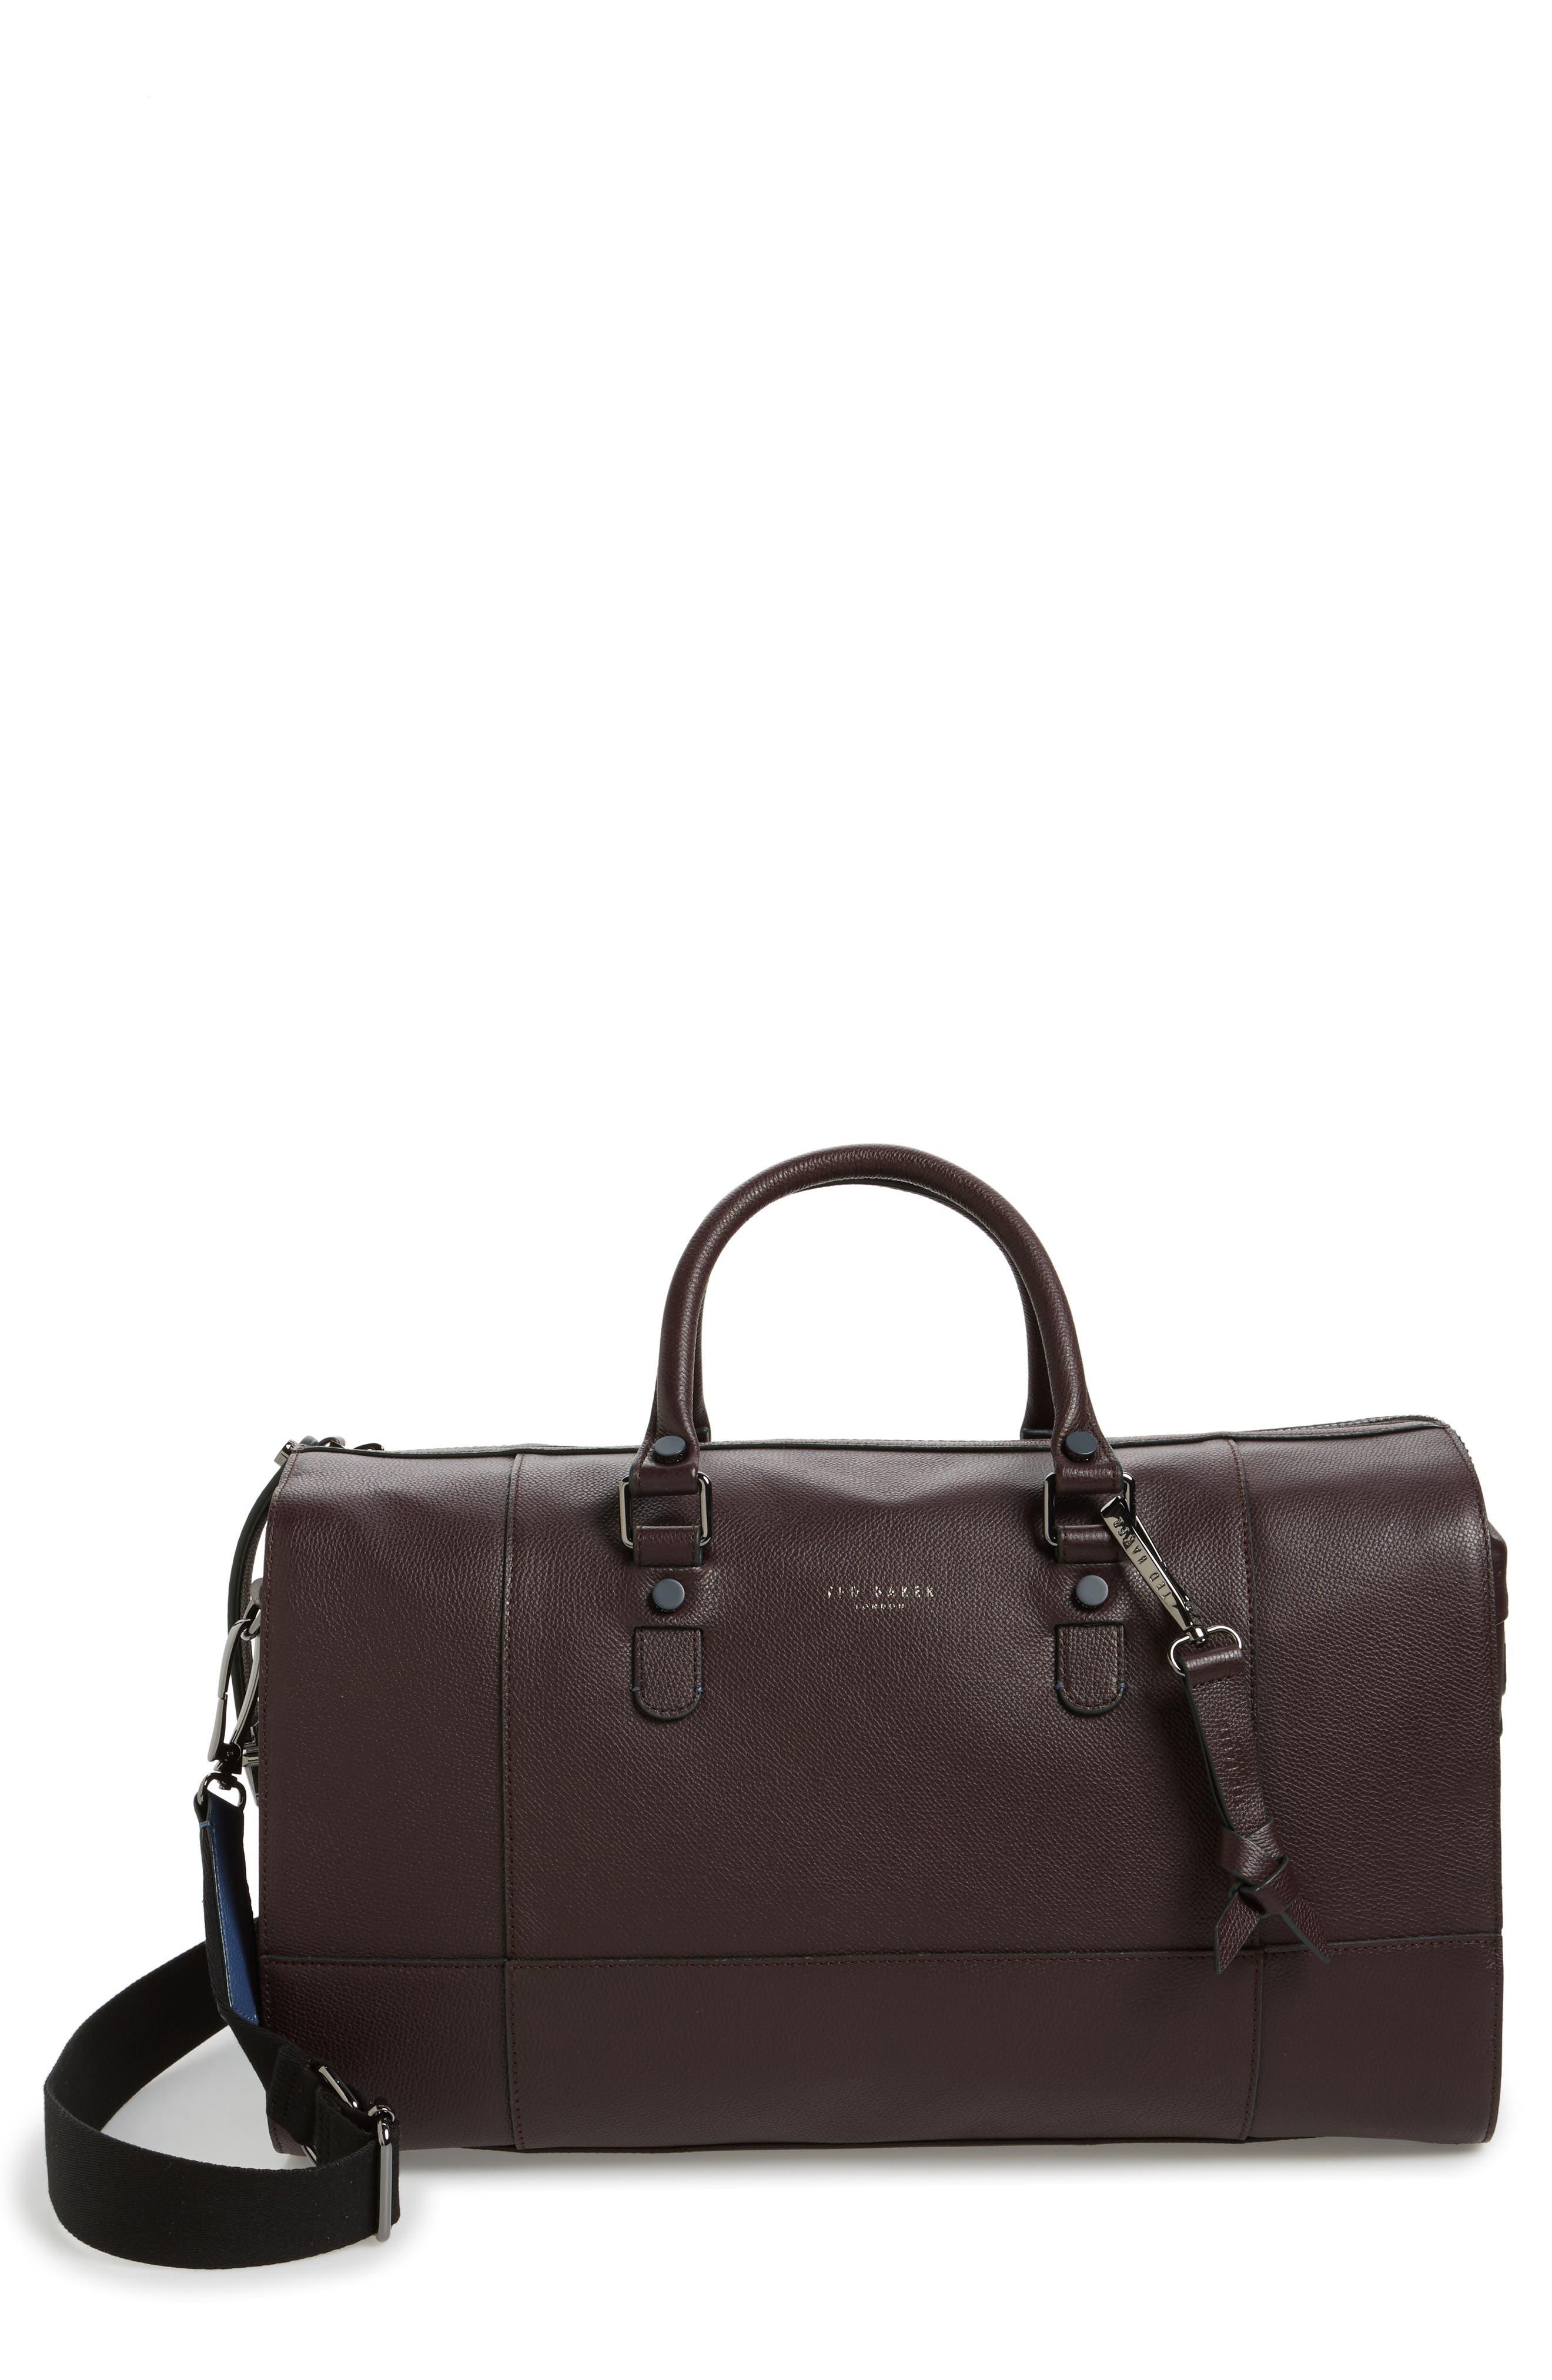 Alternate Image 1 Selected - Ted Baker London Panthea Leather Duffel Bag